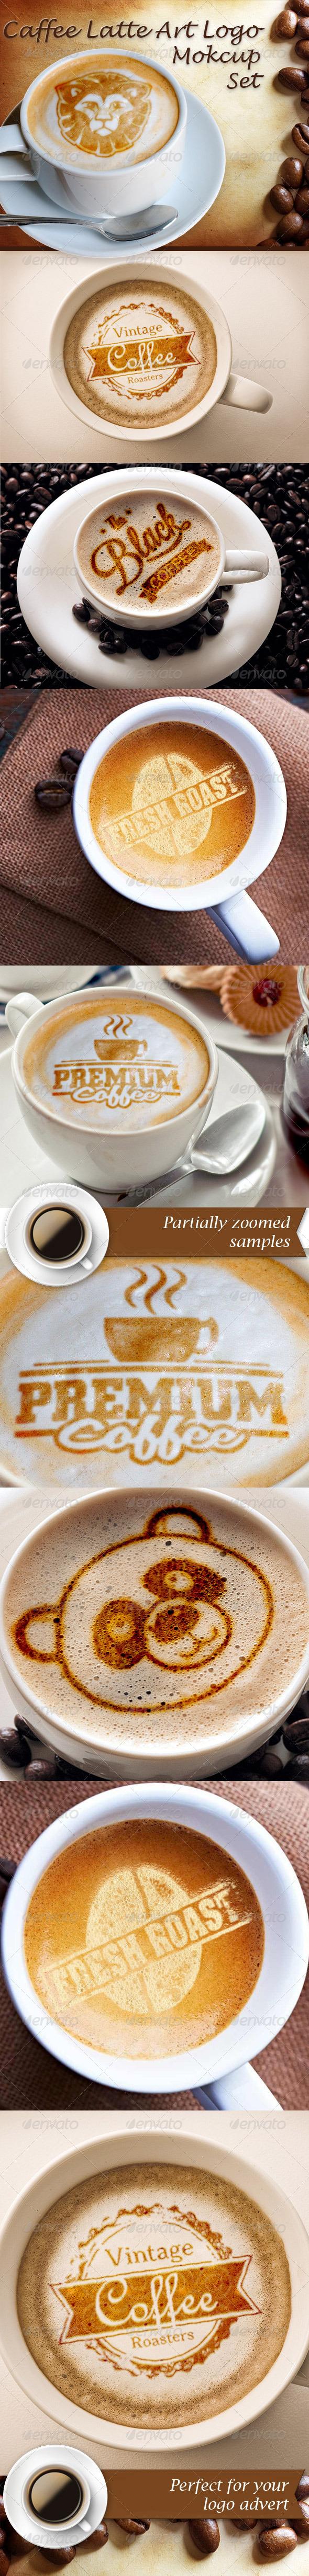 GraphicRiver Caffee Latte Art Logo Mockup Set 8570523